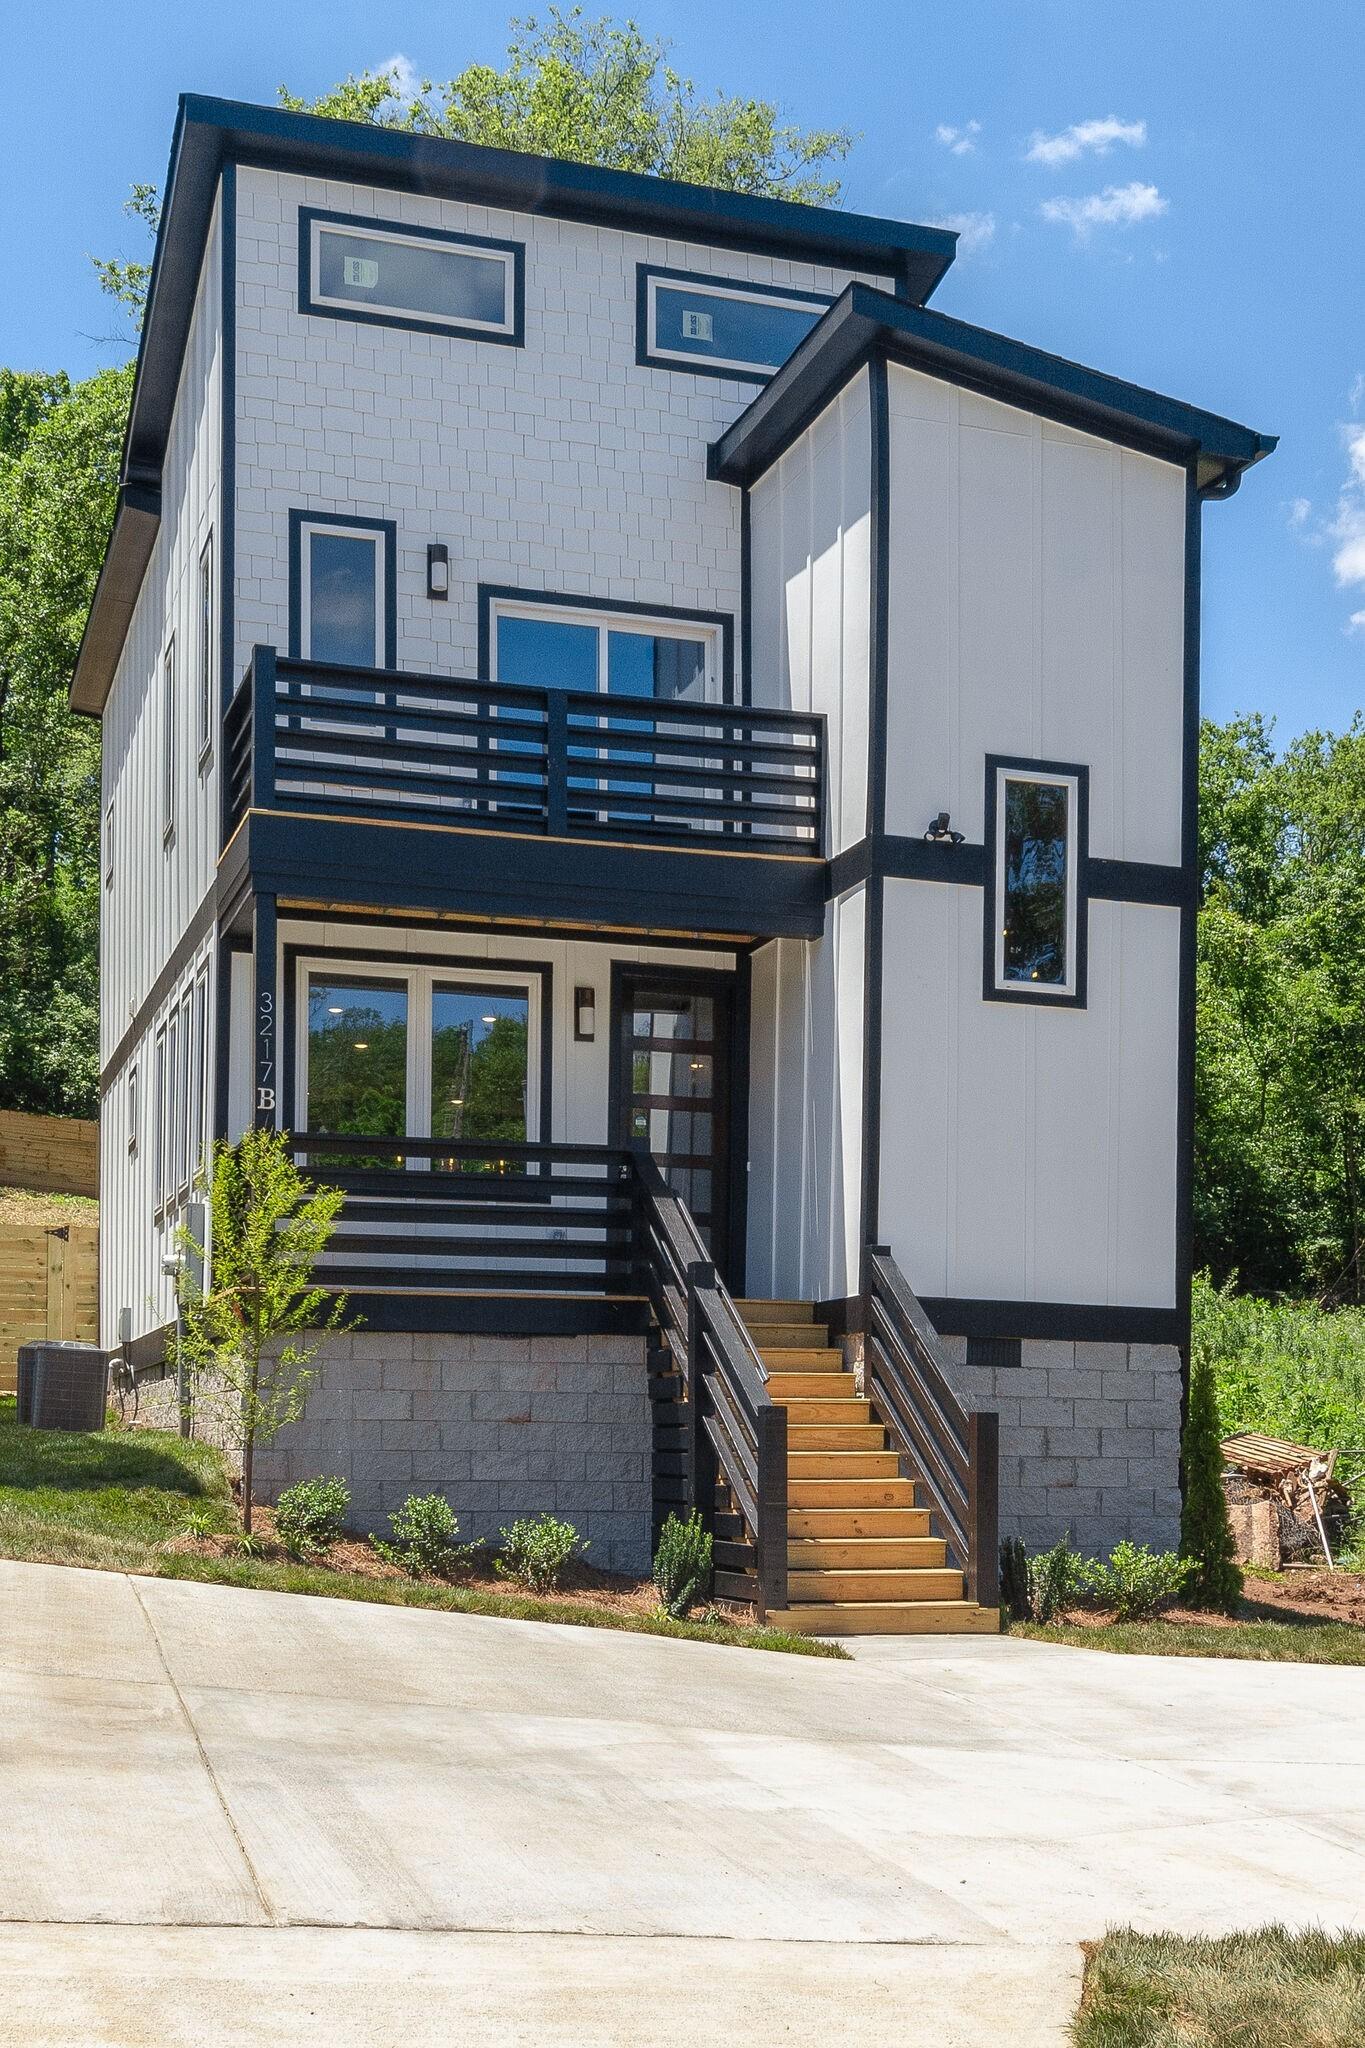 3217 Curtis St Property Photo - Nashville, TN real estate listing